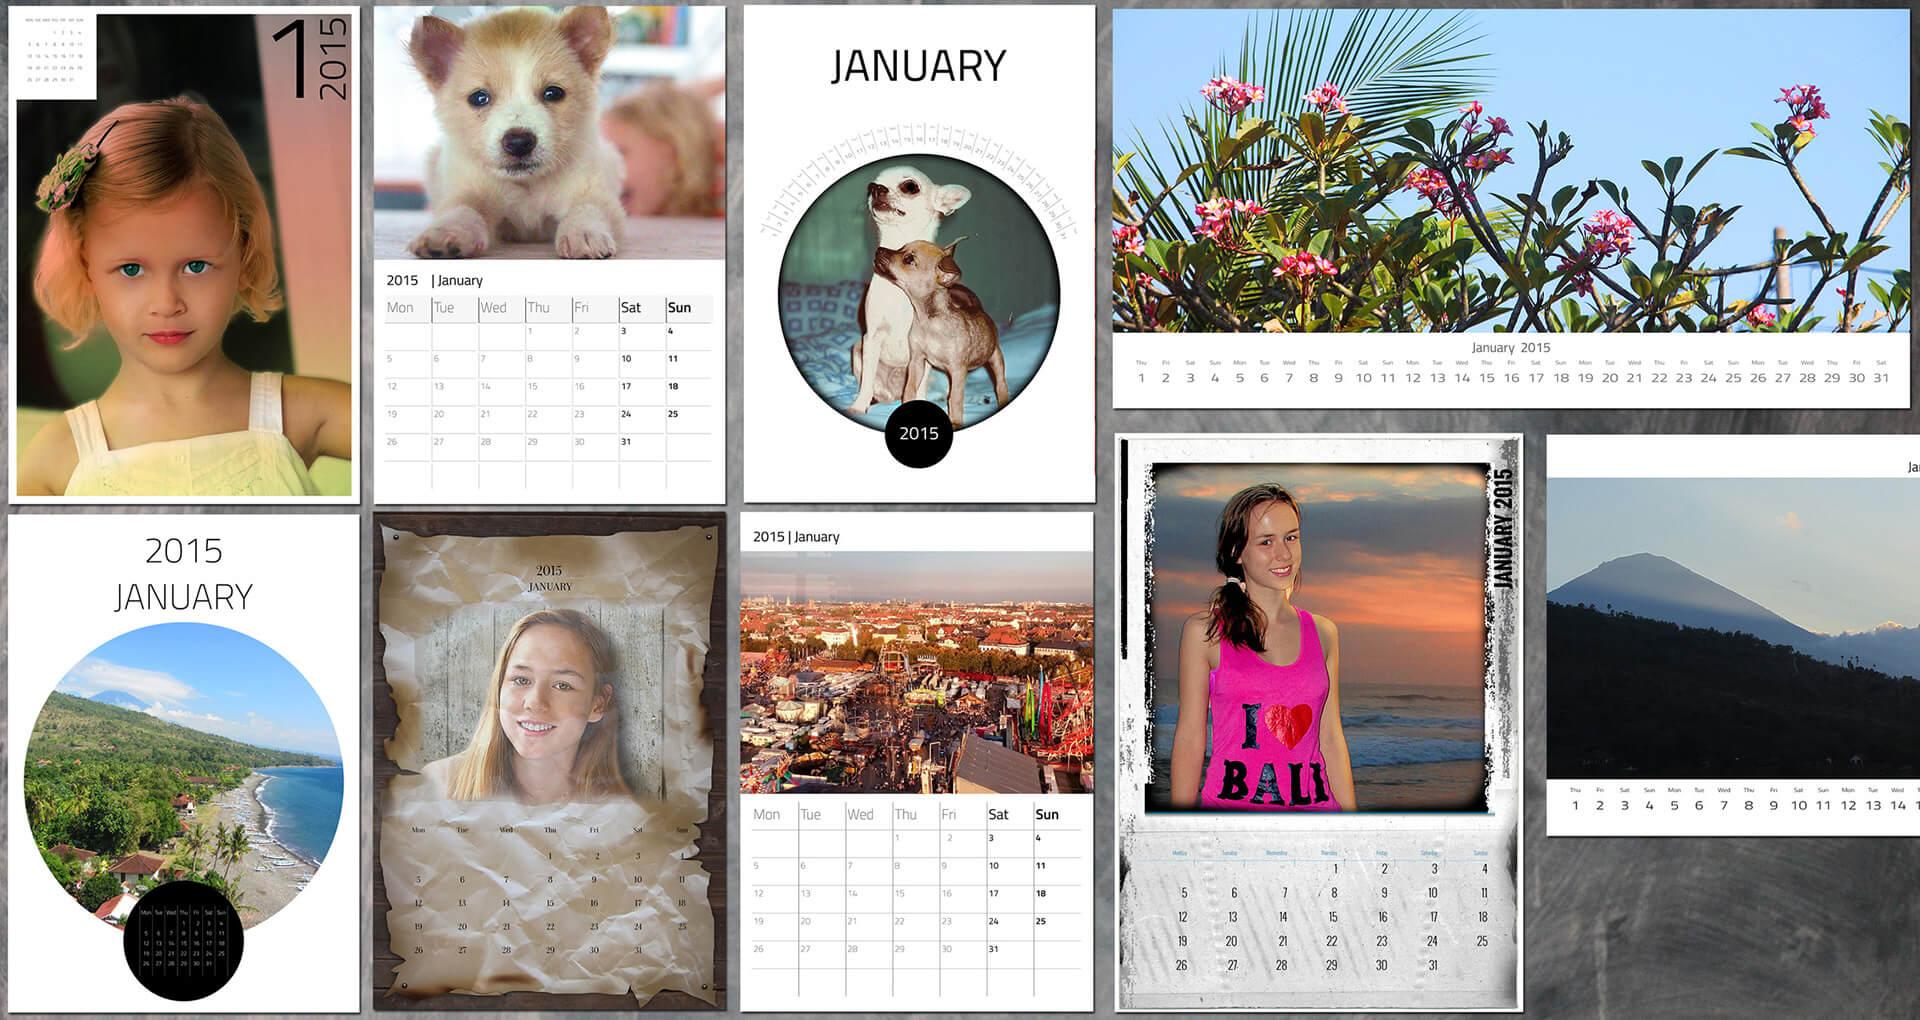 webtoprint fotobuch variable grafik walltattoo popart calendar smartphone case greeting card 5 2